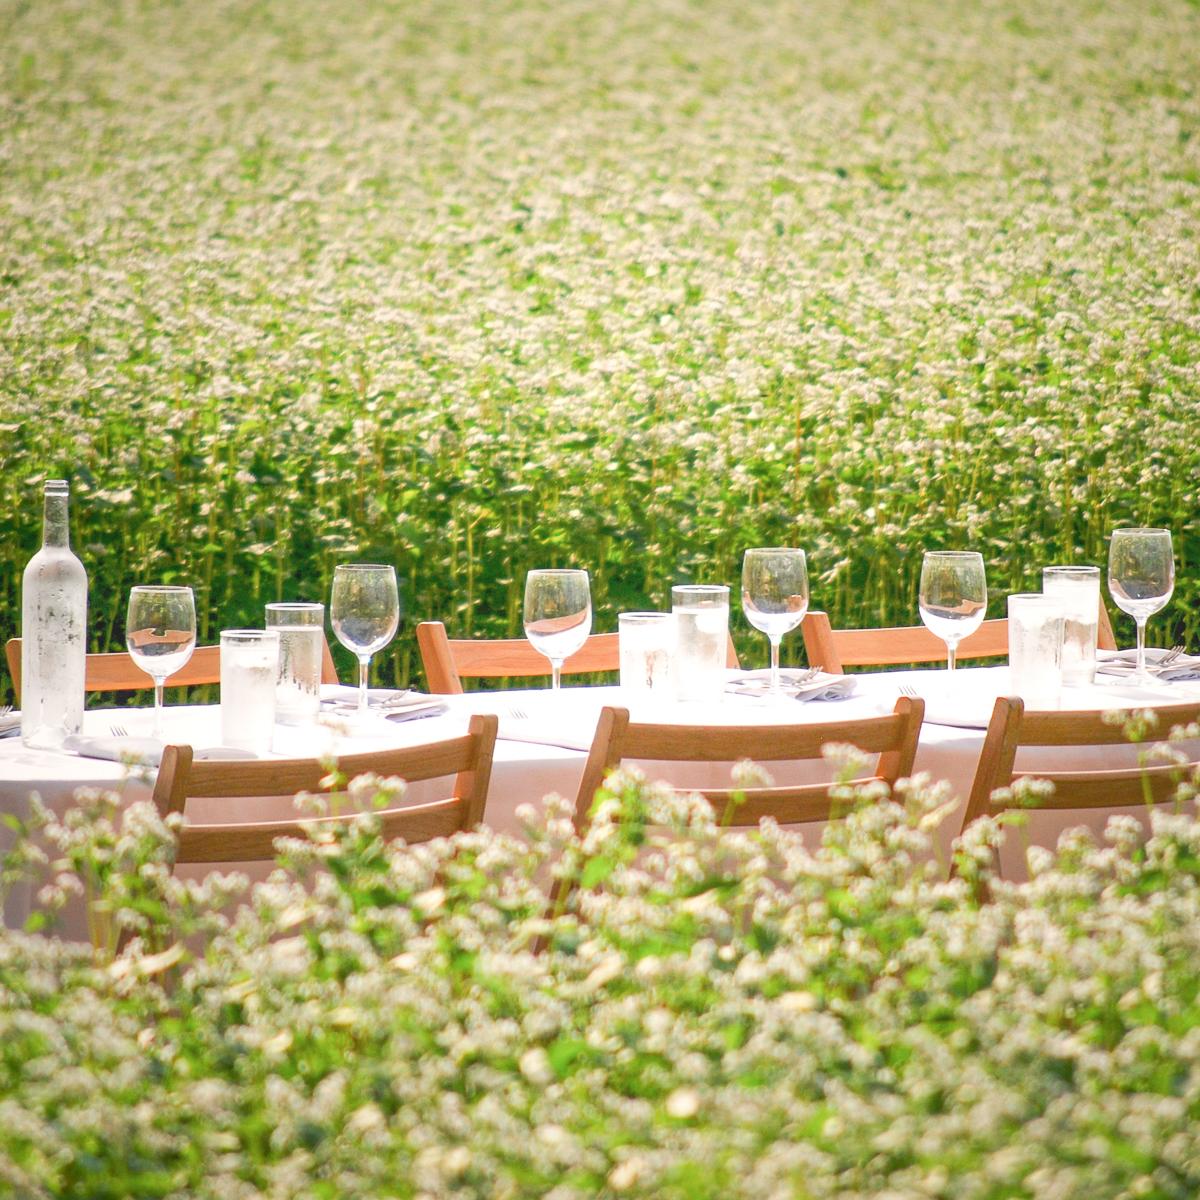 Secret Dinner präsentiert Dinner im Grünen